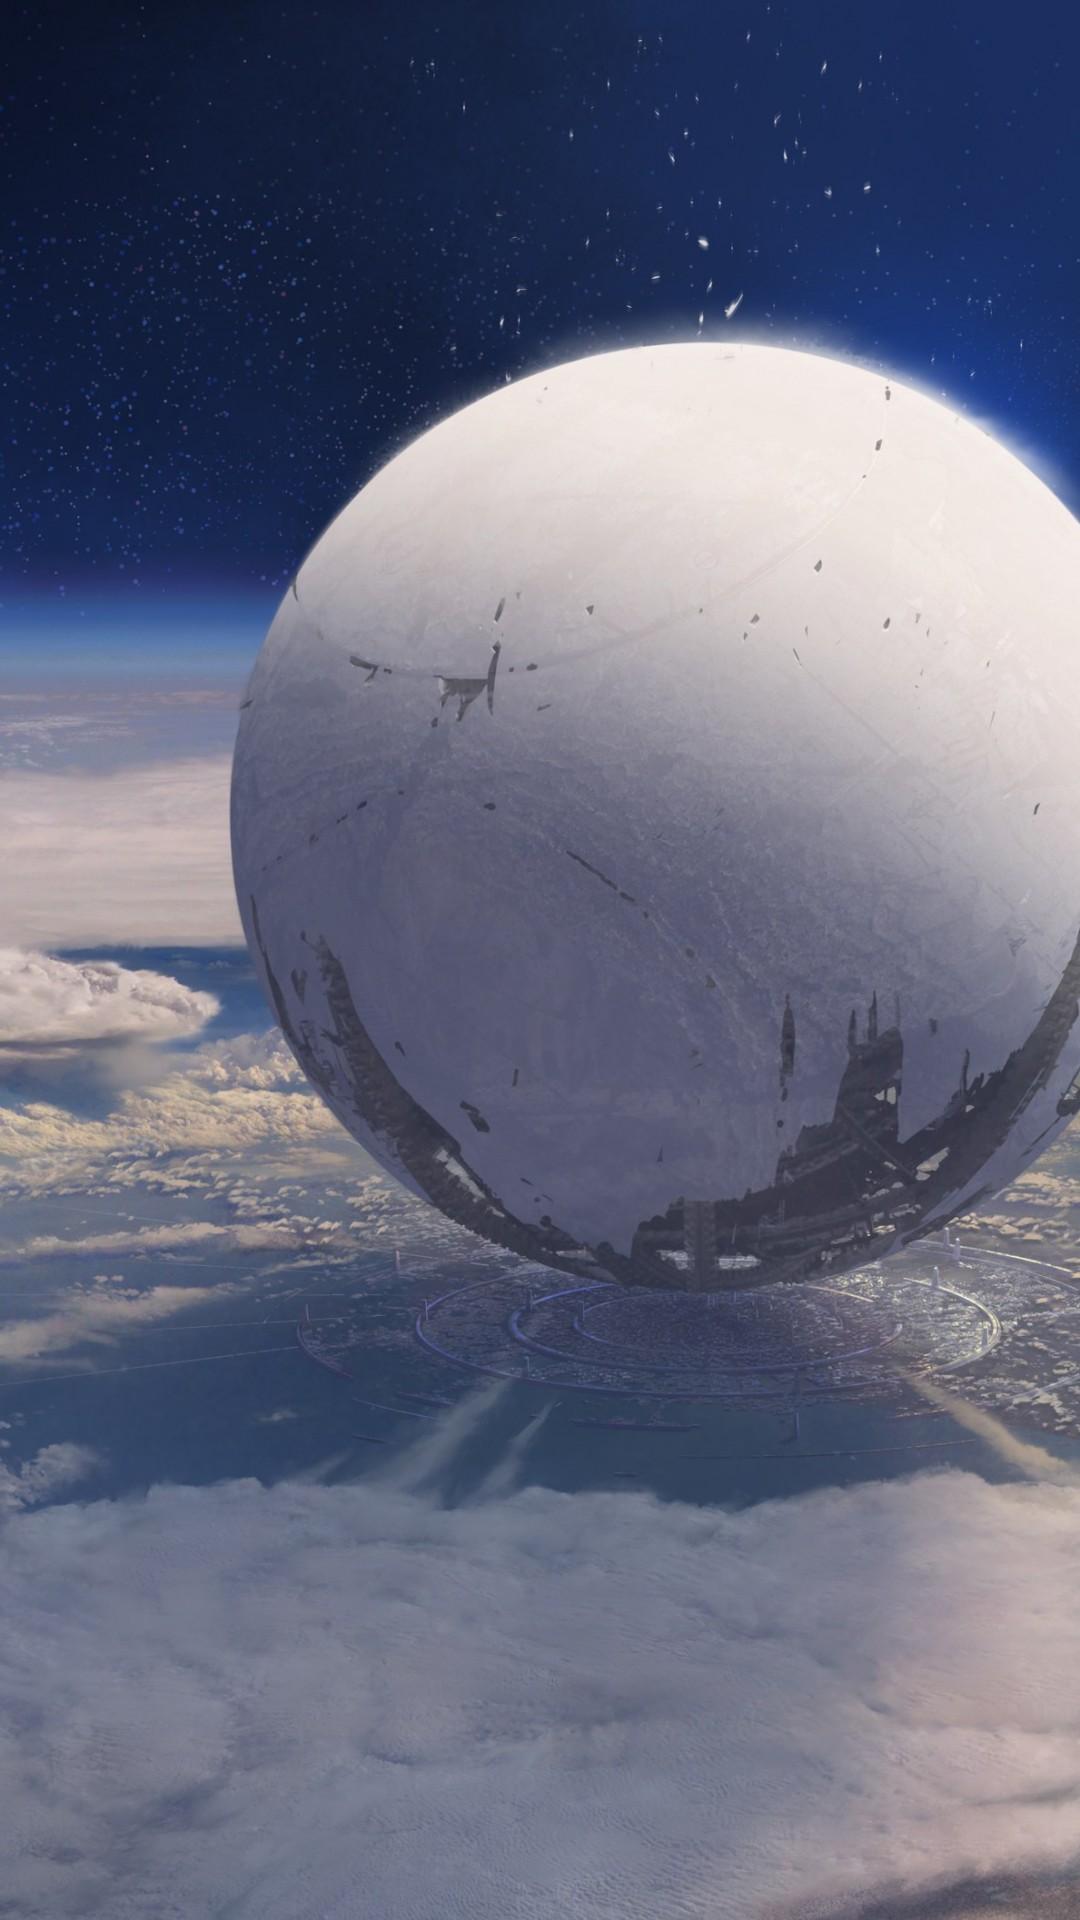 Wallpaper Destiny, game, MMOFPS, sci-fi, space, sphere ... | 1080 x 1920 jpeg 250kB